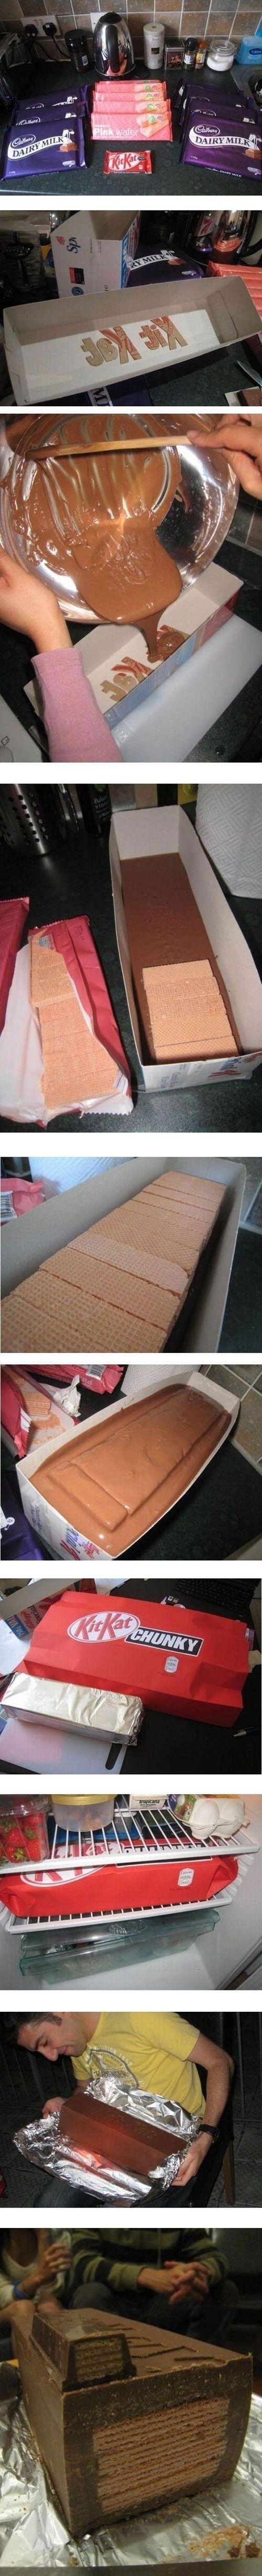 How to make  a giant Kit Kat Bar